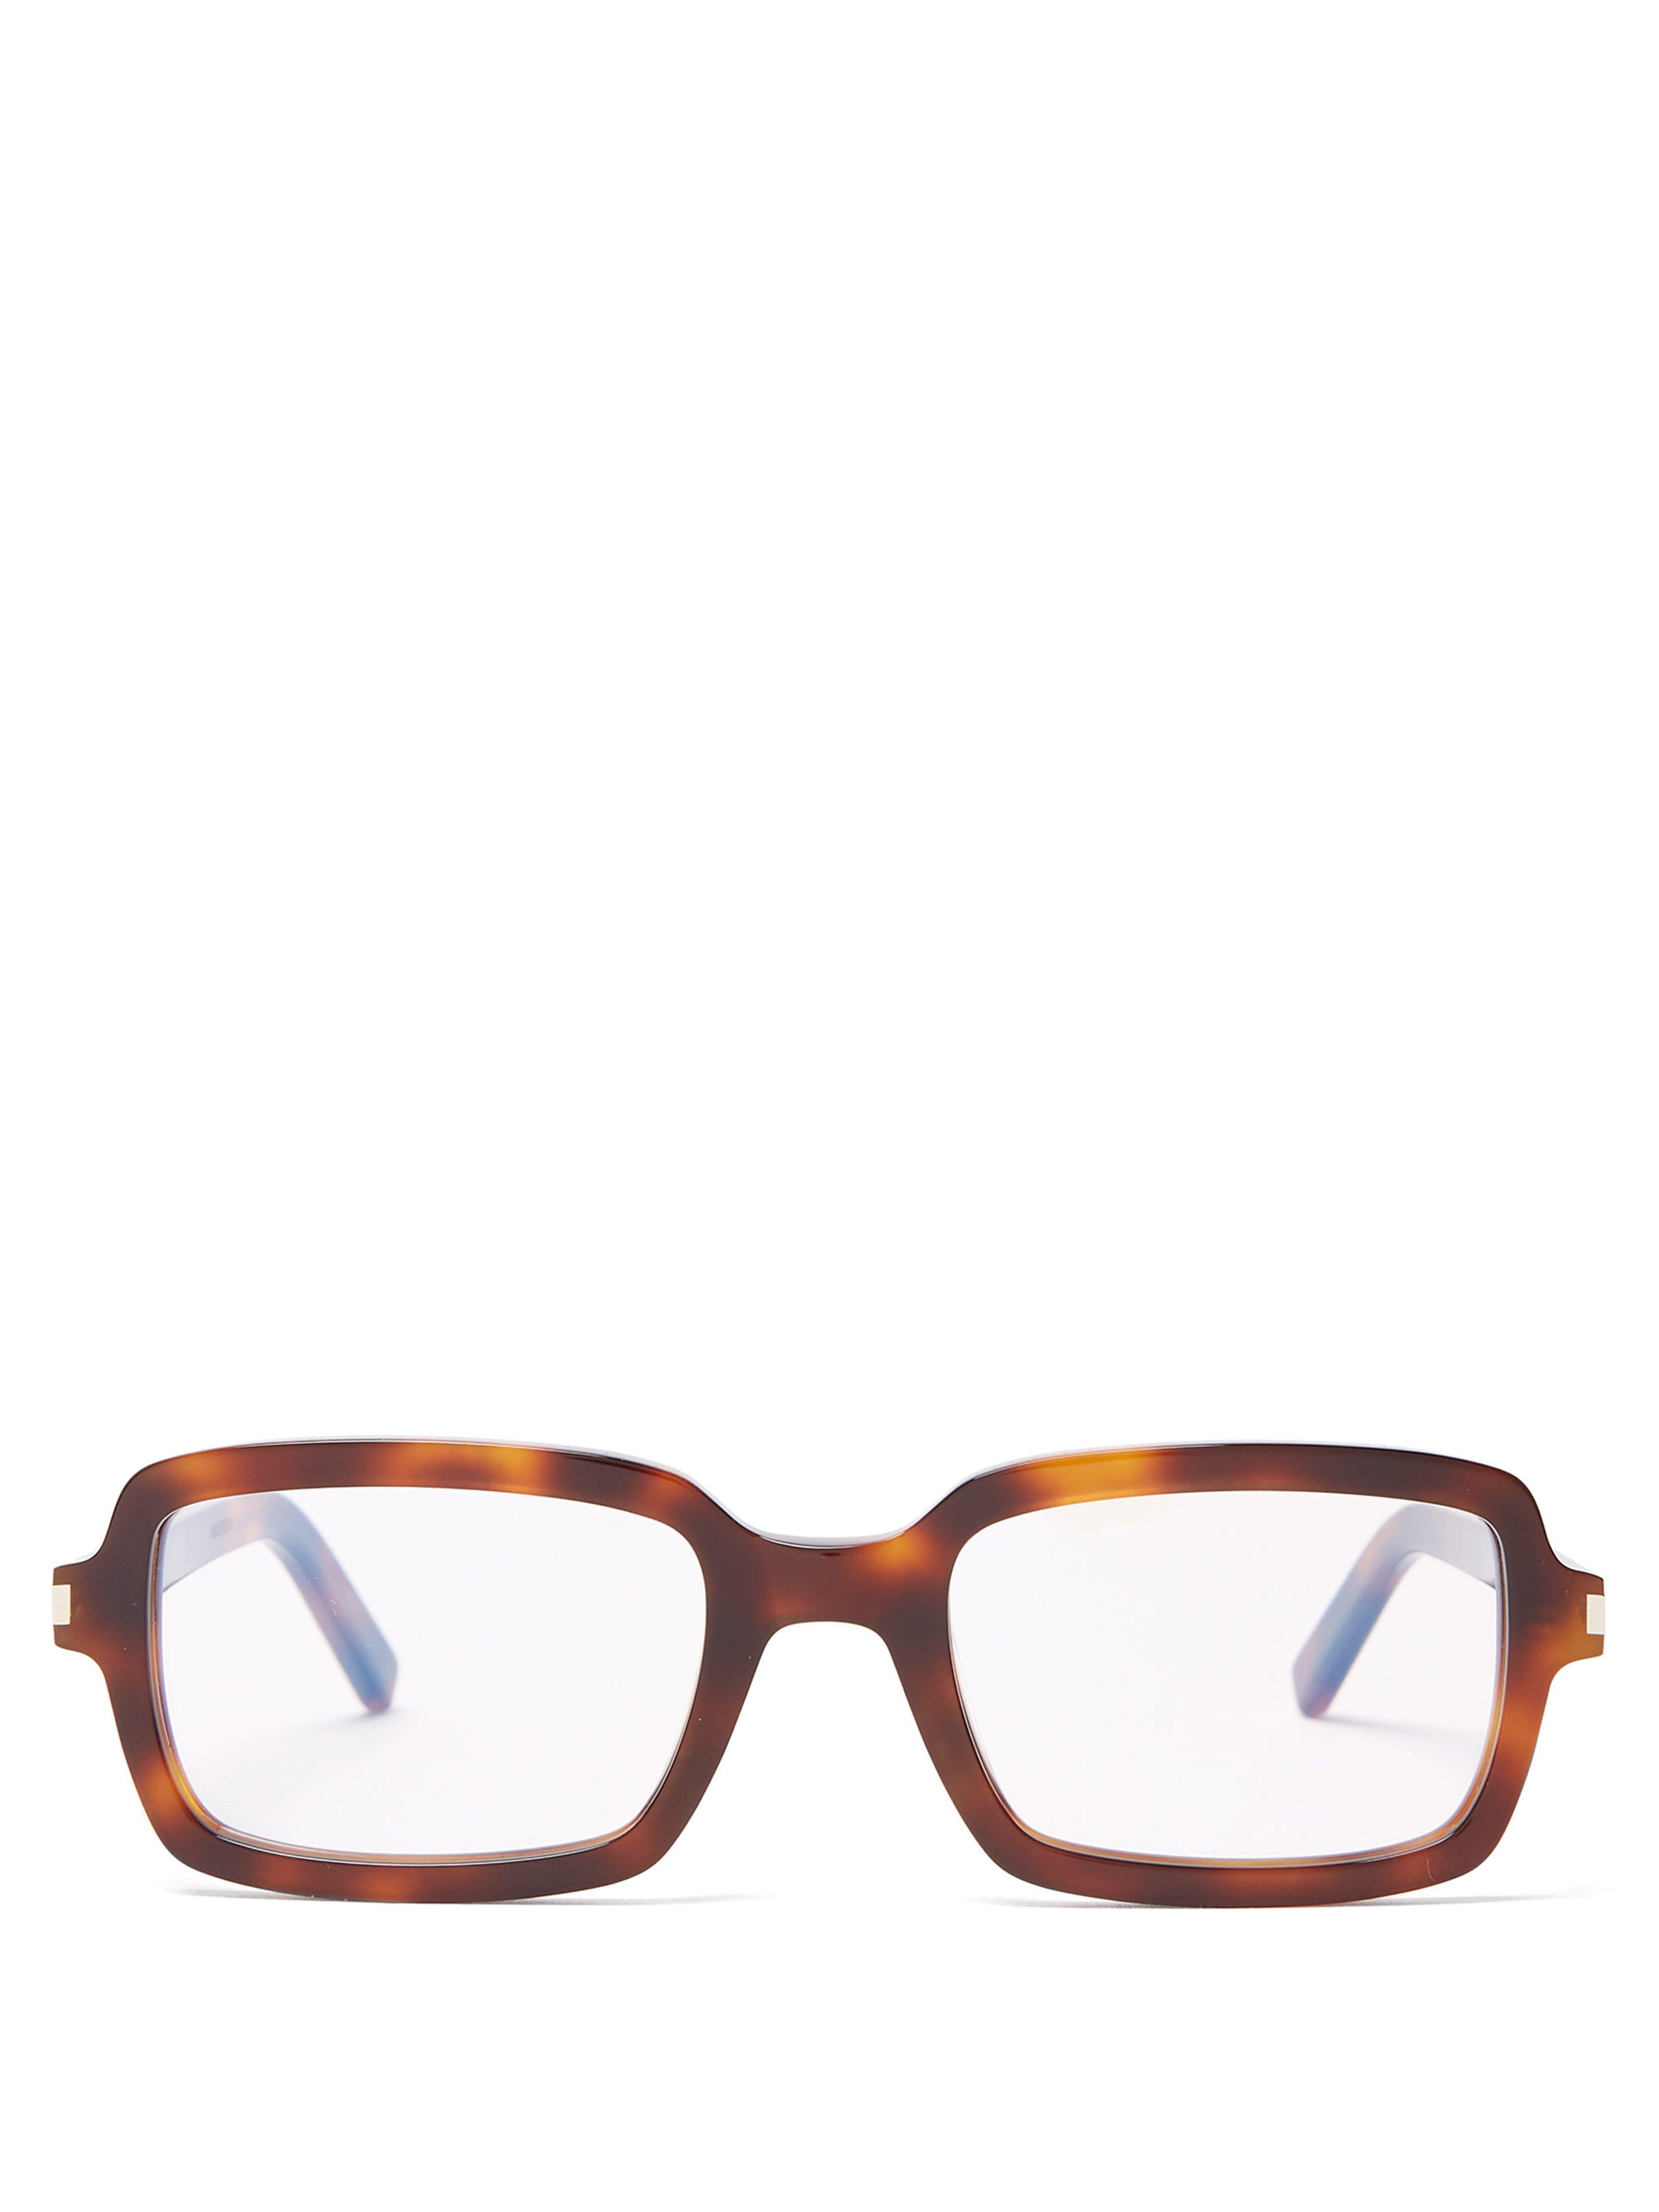 093ca34f90b6 Saint Laurent Rectangular Tortoiseshell Acetate Glasses in Brown - Lyst